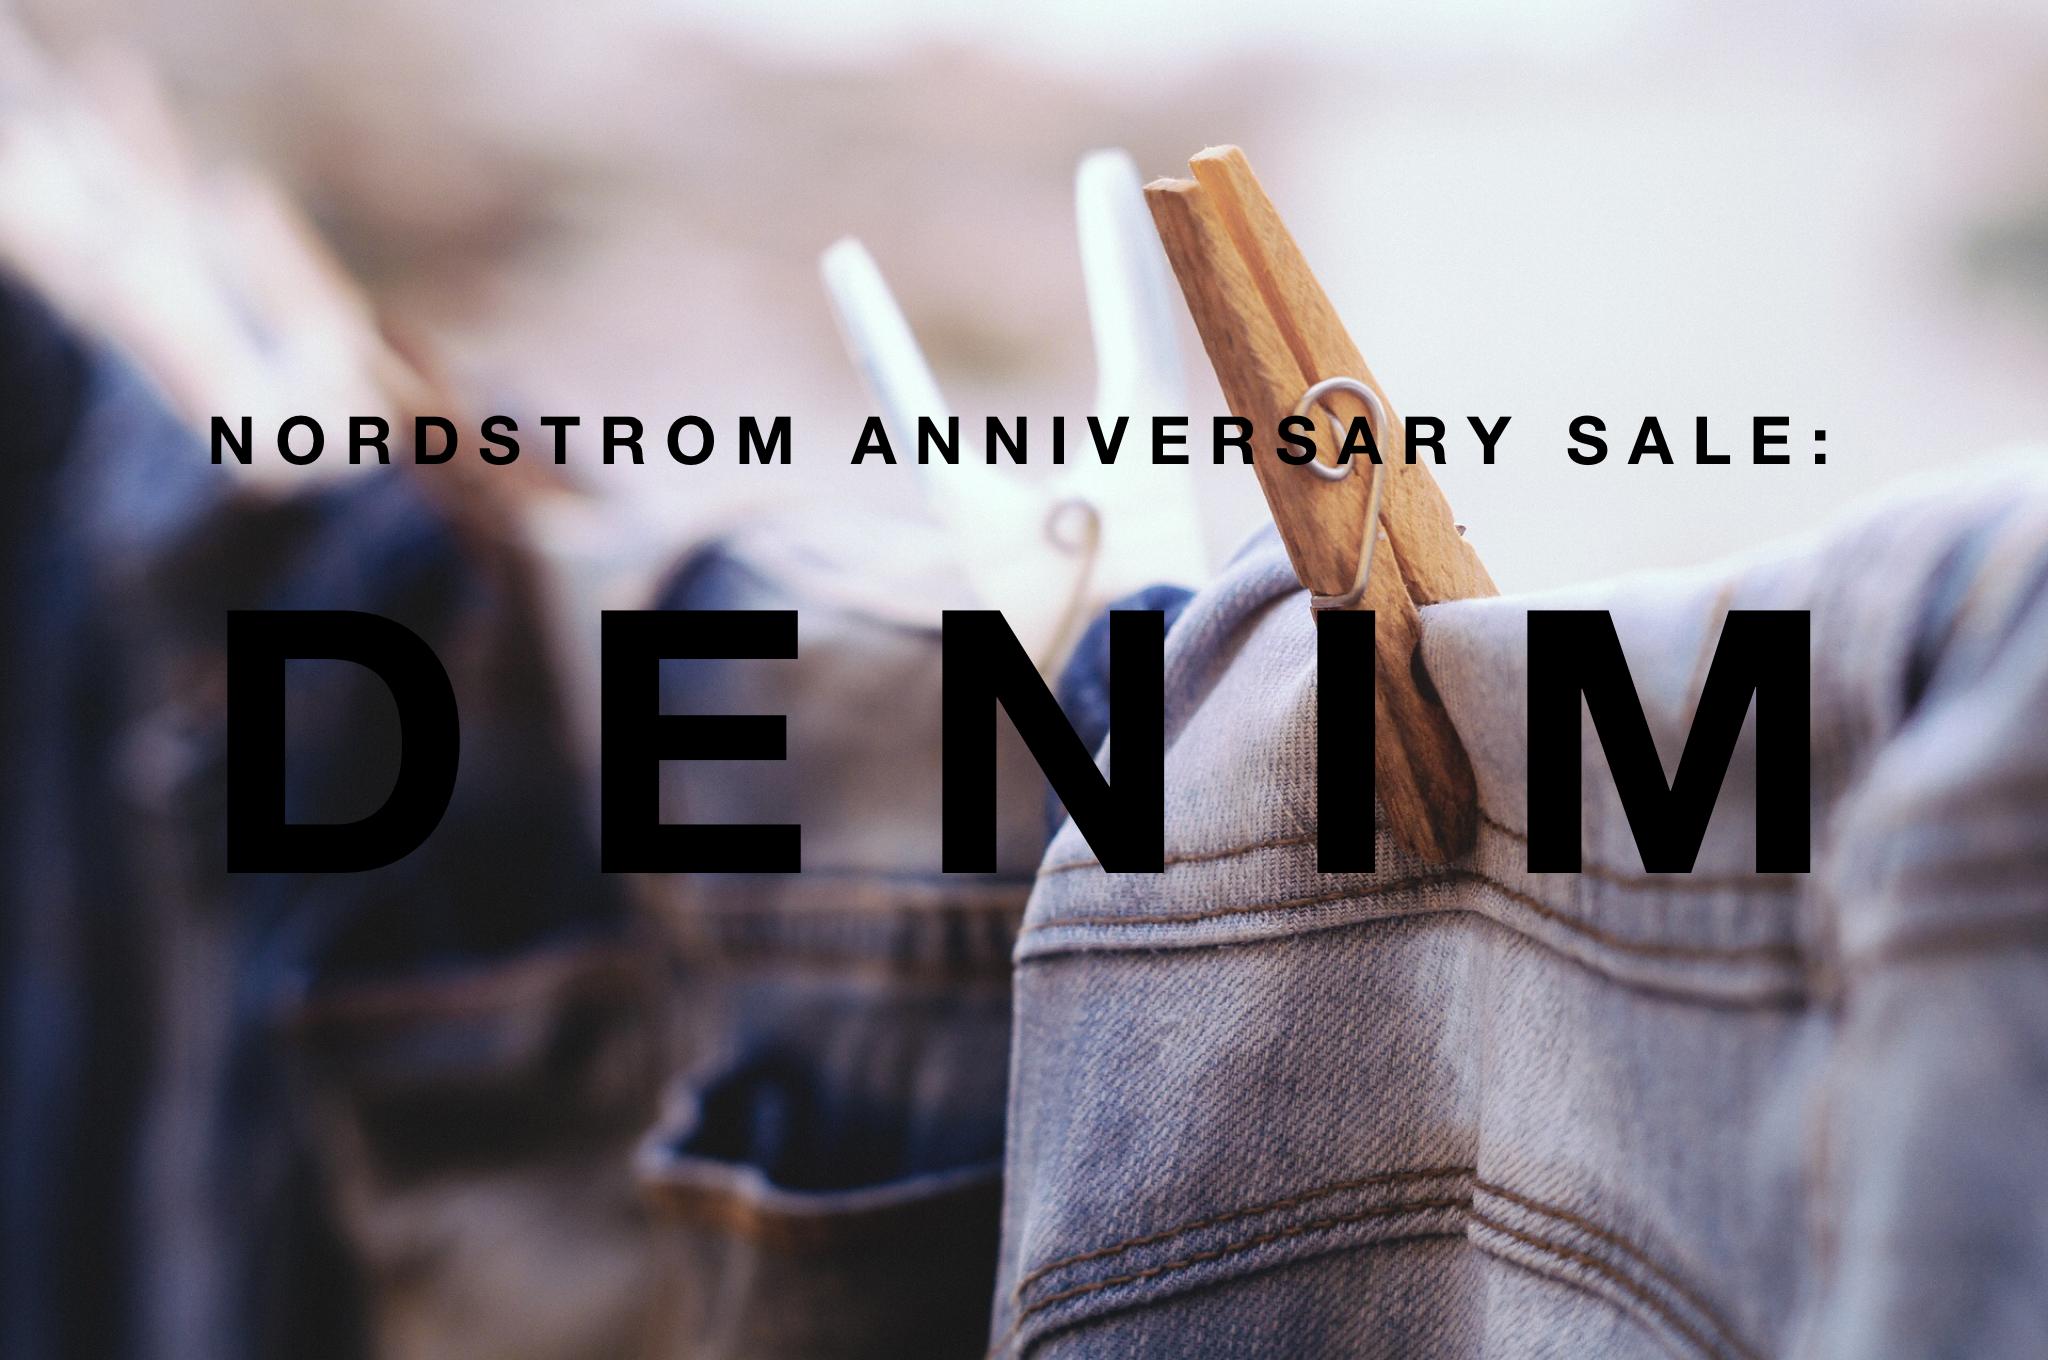 Nordstrom Anniversary Sale!!